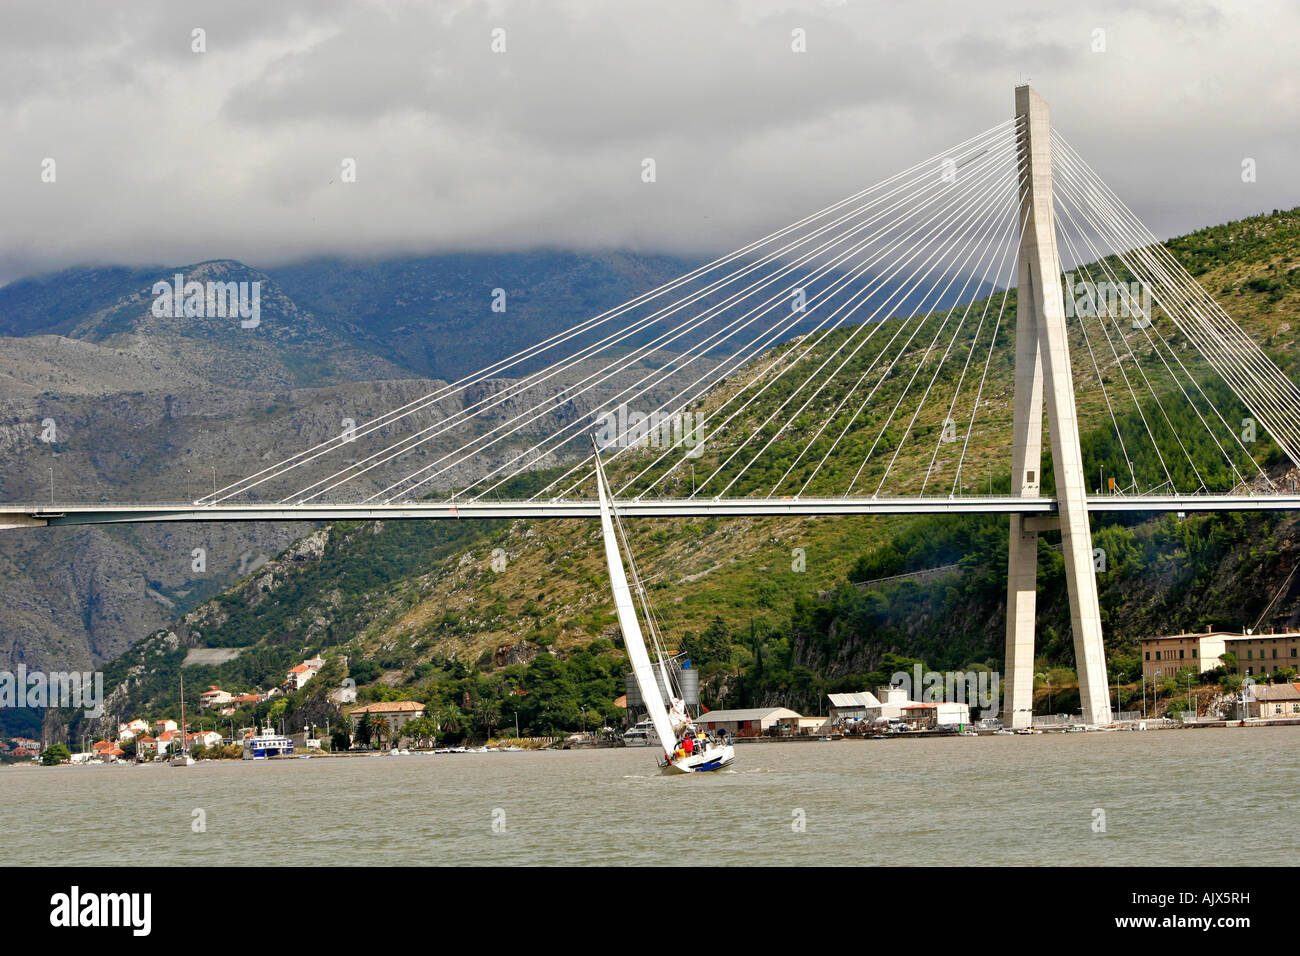 Segelyacht unter Tudjmann Bruecke, nahendes Gewitter a| Sailing yacht under Tudjmann Bridge, approaching thunderstorm - Stock Image